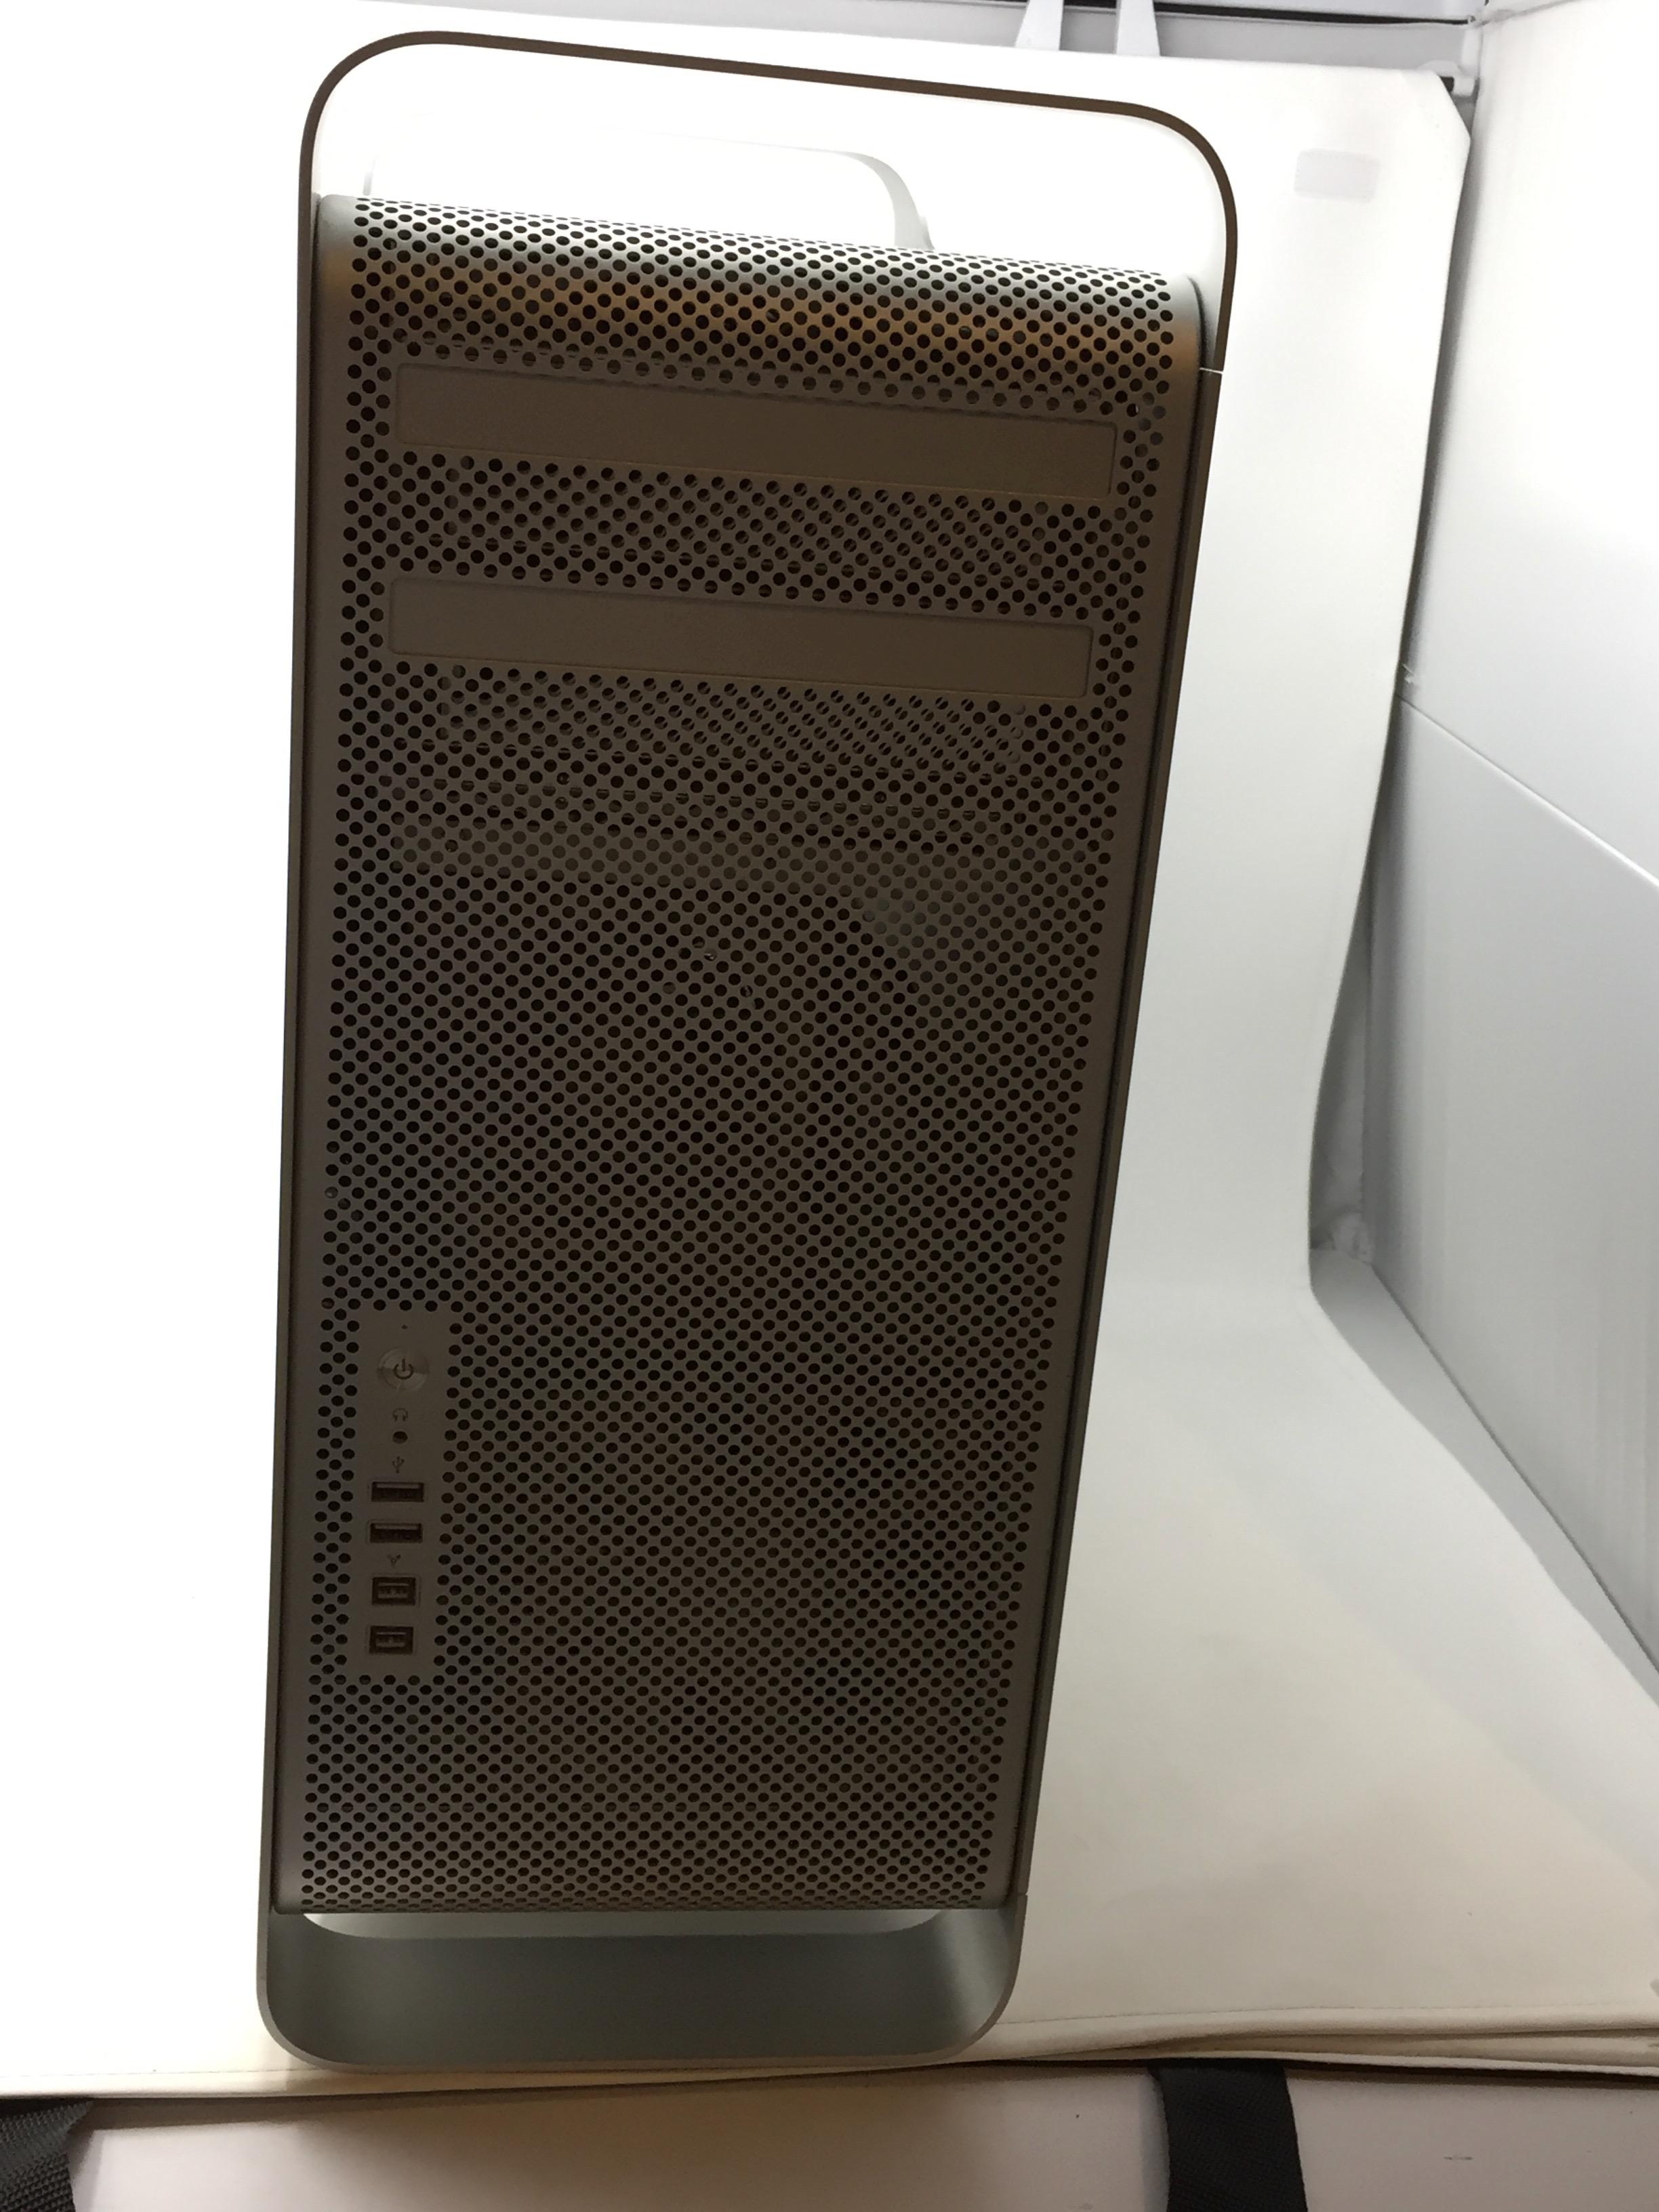 Mac Pro Mid 2012 (2 x Intel Xeon 2.66 GHz 32 GB RAM 1 TB SSD), 6 Core Intel Xeon 2,66 GHz (tiene 2  procesadores iguales), 48 GB DDR3 (ECC) 1333MHz, 4 SSD de 512 GB cada una, imagen 5